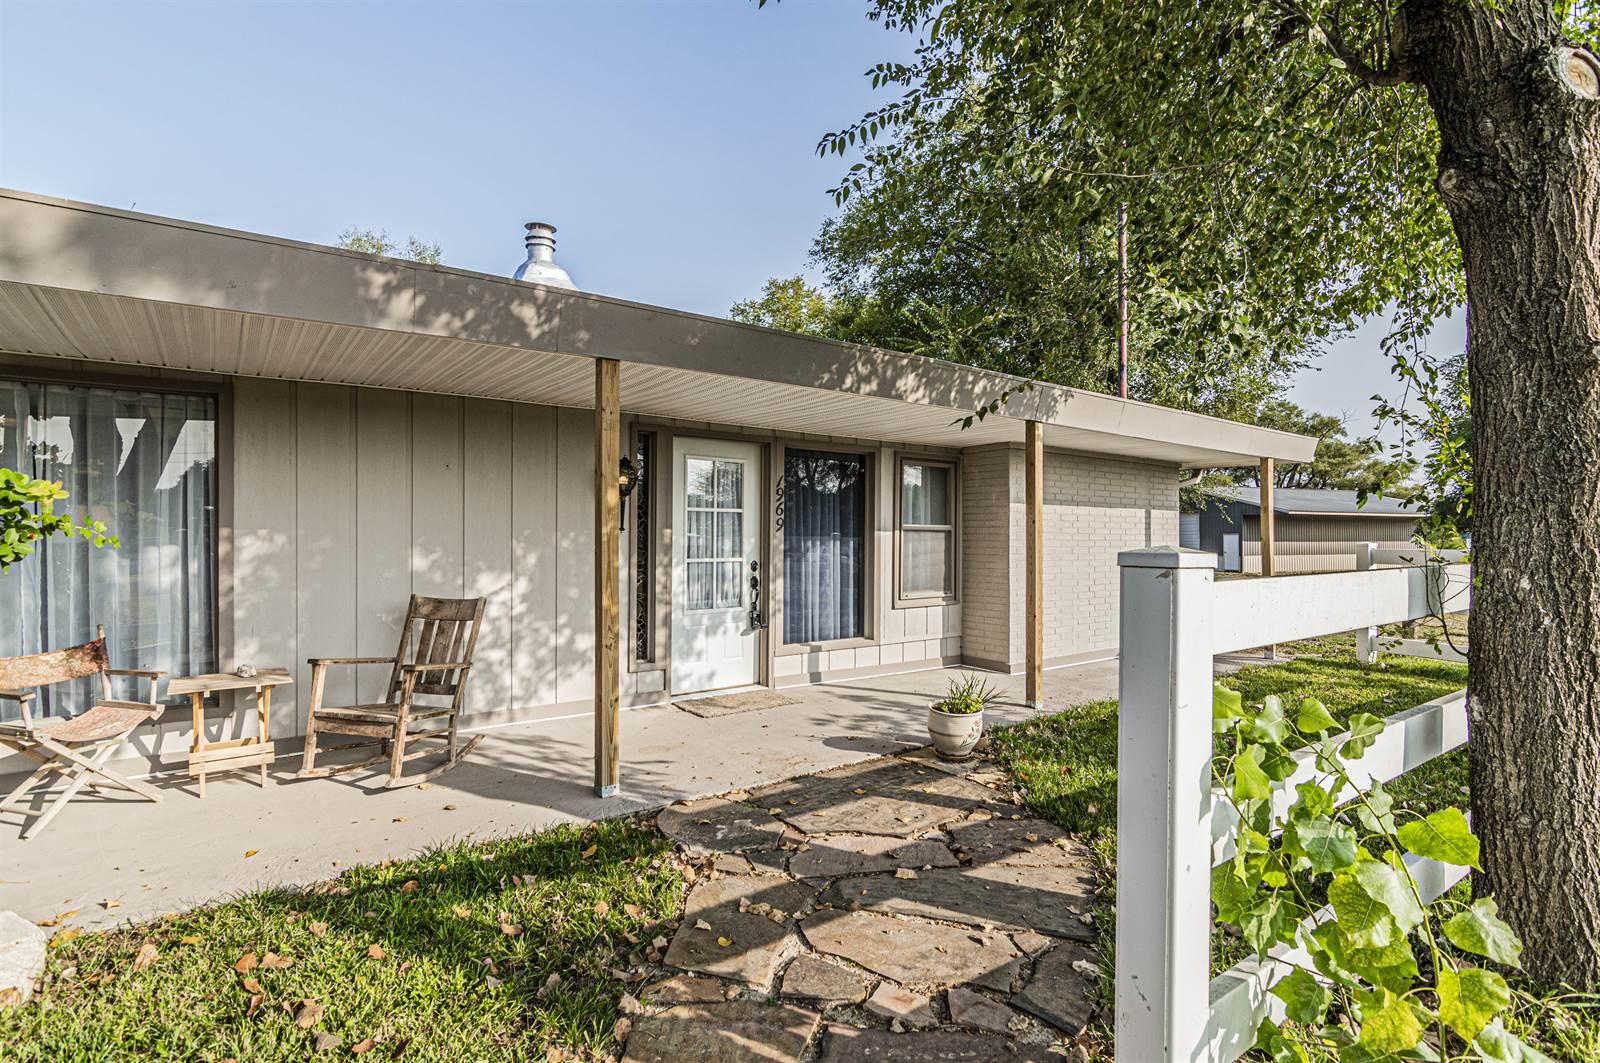 1969 2725 Ave, Chapman, KS 67431